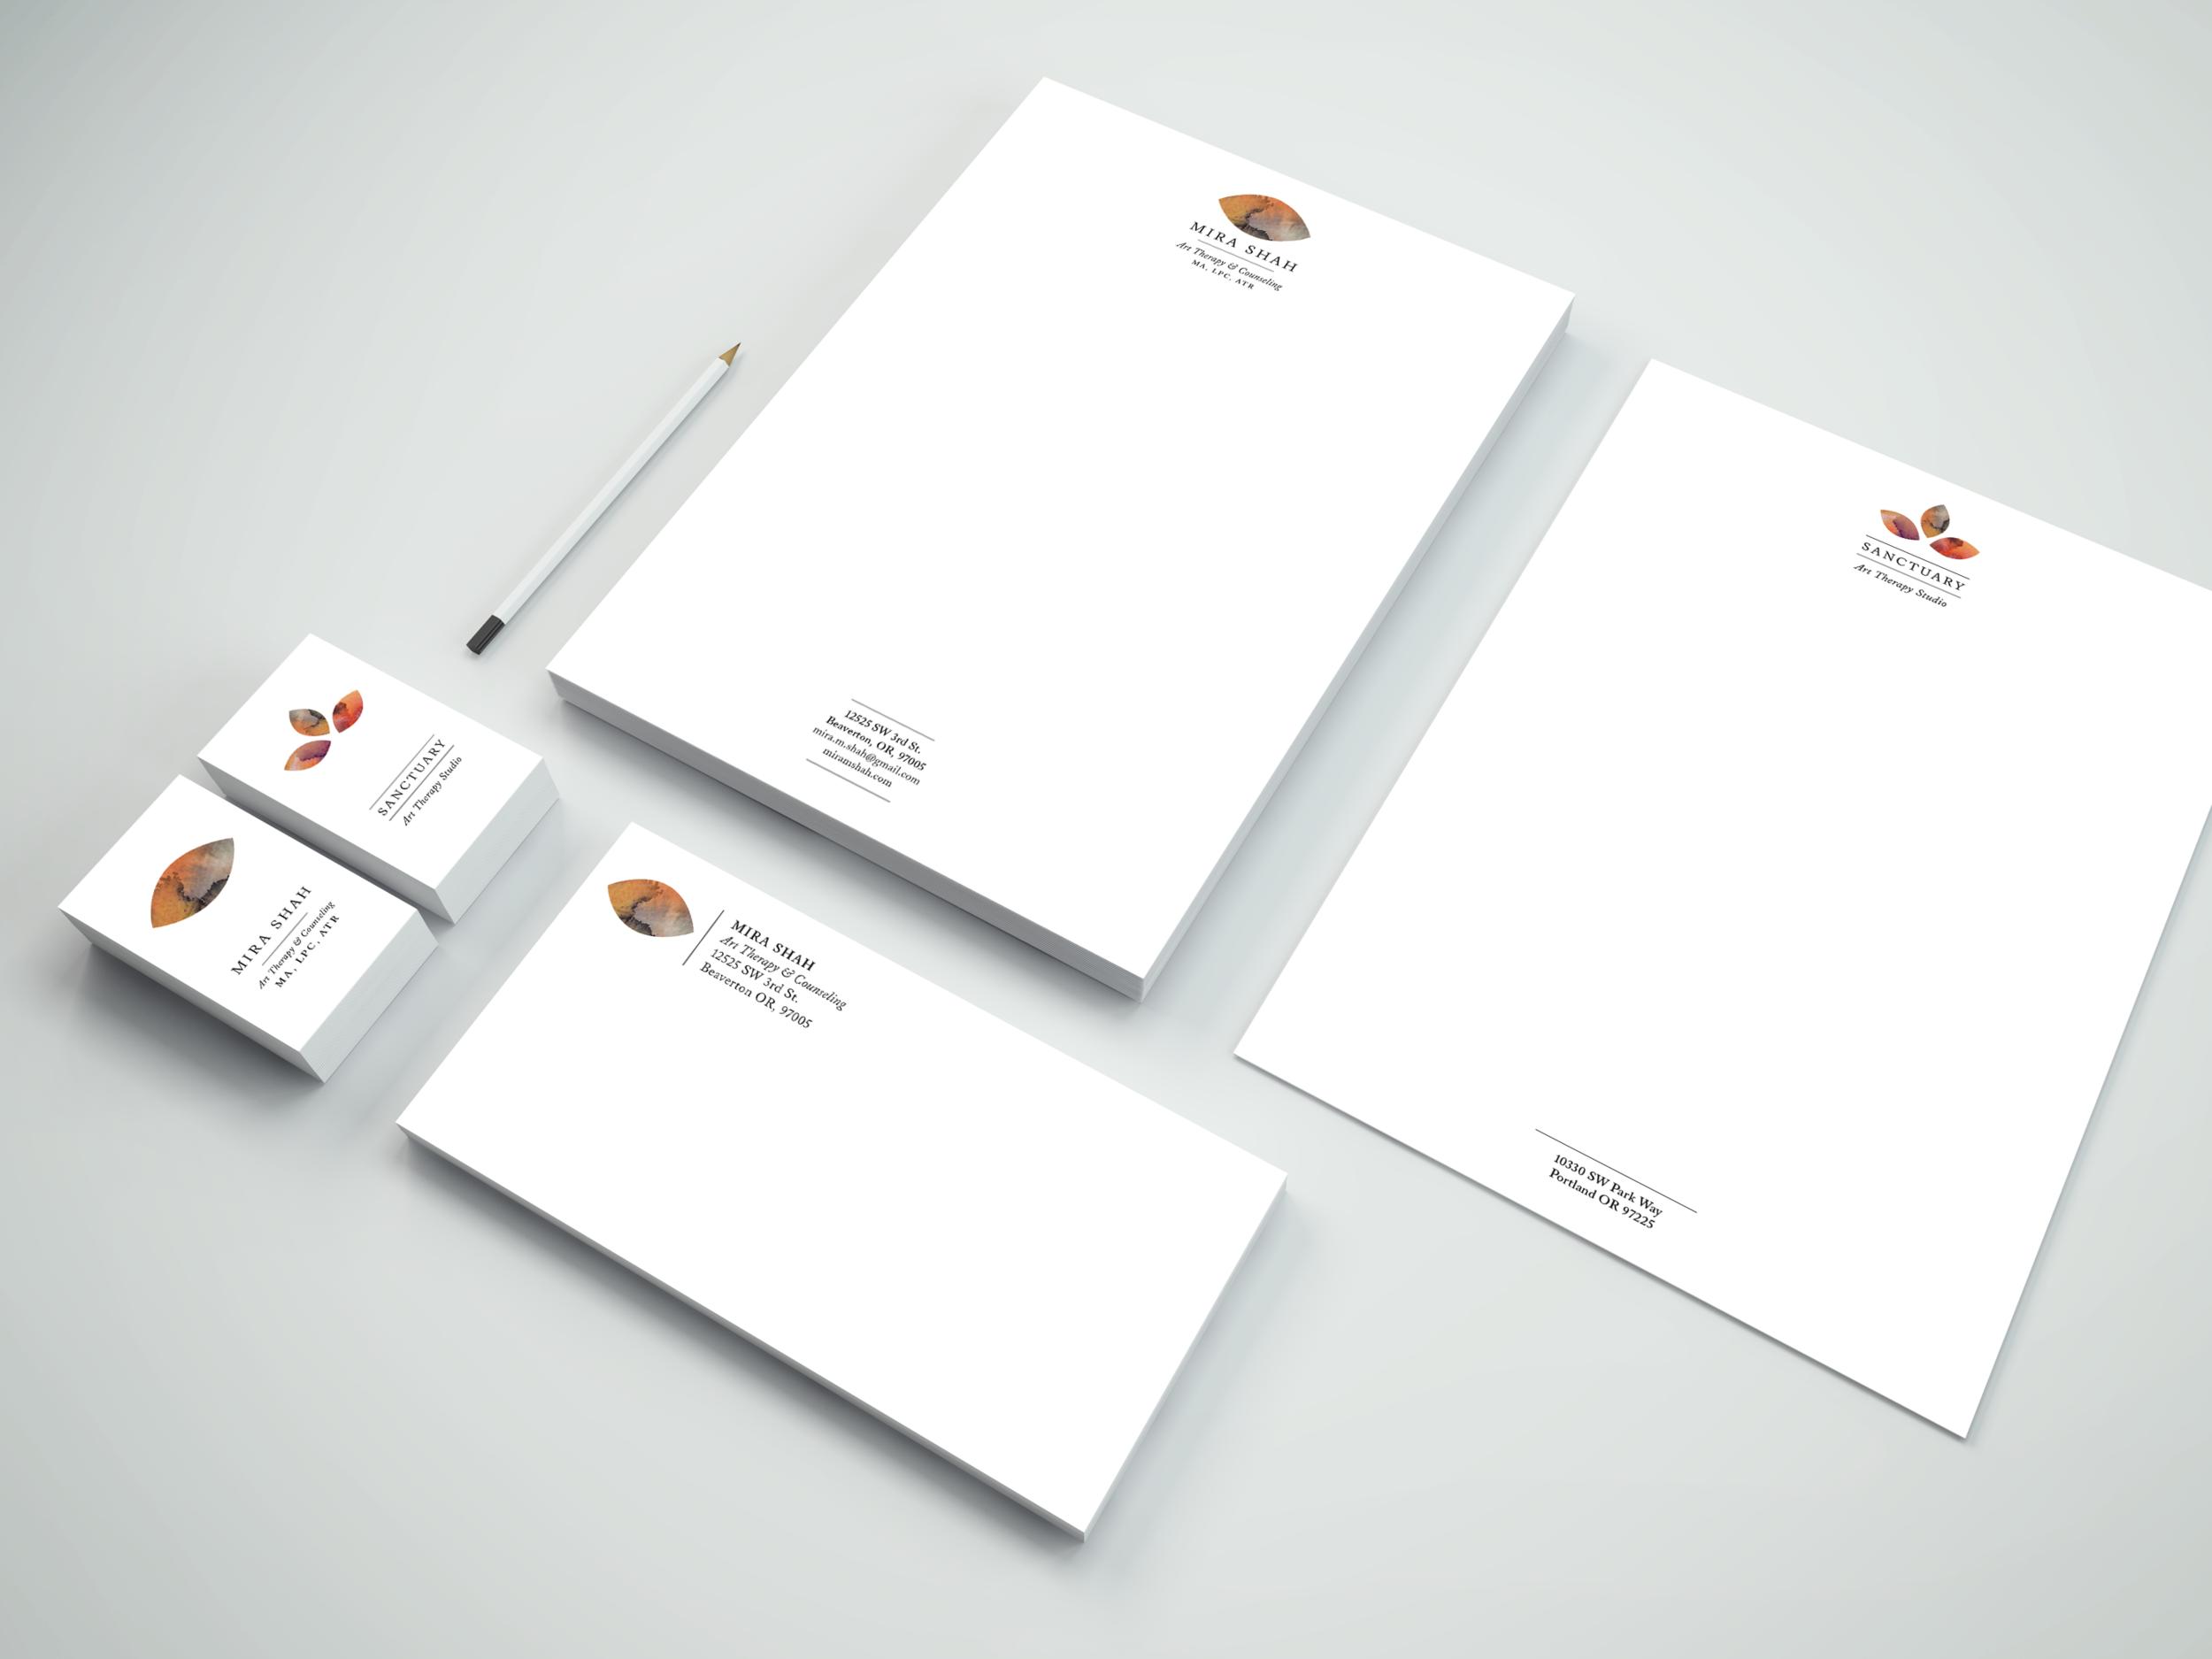 Branding-Stationery Mockup Vol.6.png